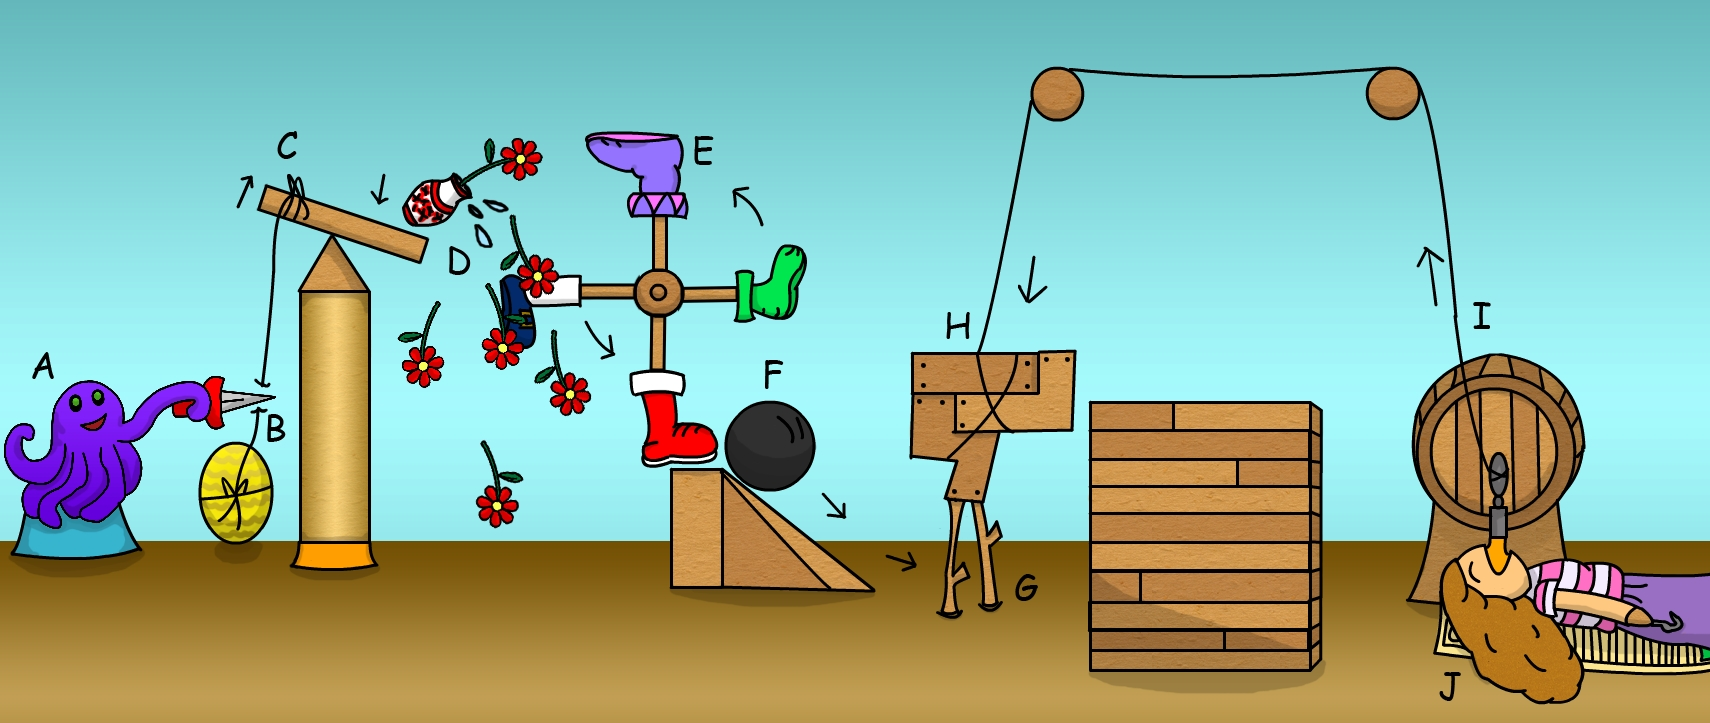 10 Fabulous Rube Goldberg Machine Ideas 10 Steps rube goldberg machine thinglink 2020